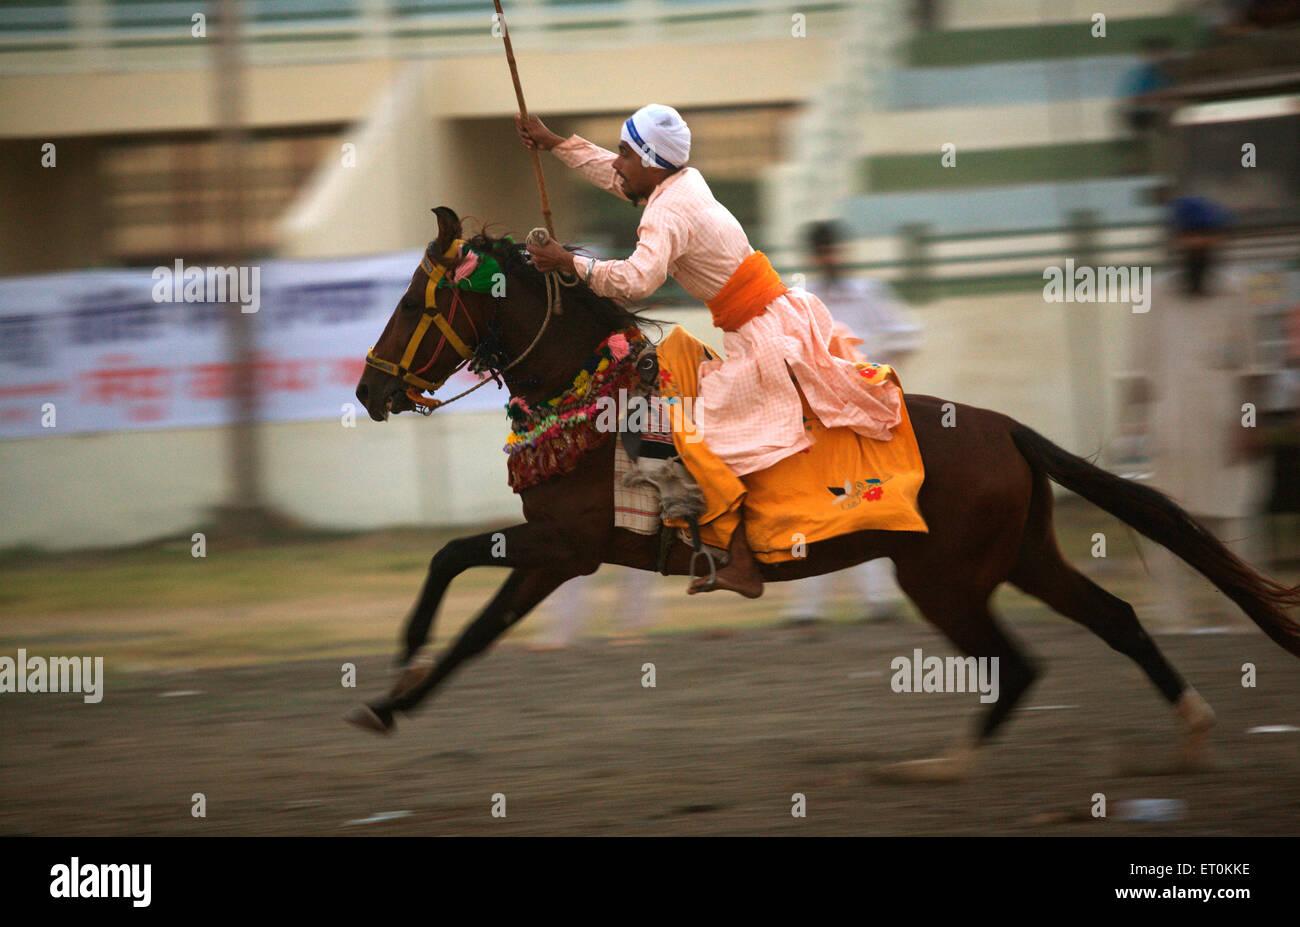 Nihang Sikh warrior performing stunts ;celebrations Consecration perpetual Sikh Guru Granth Khalsa Sports ground - Stock Image